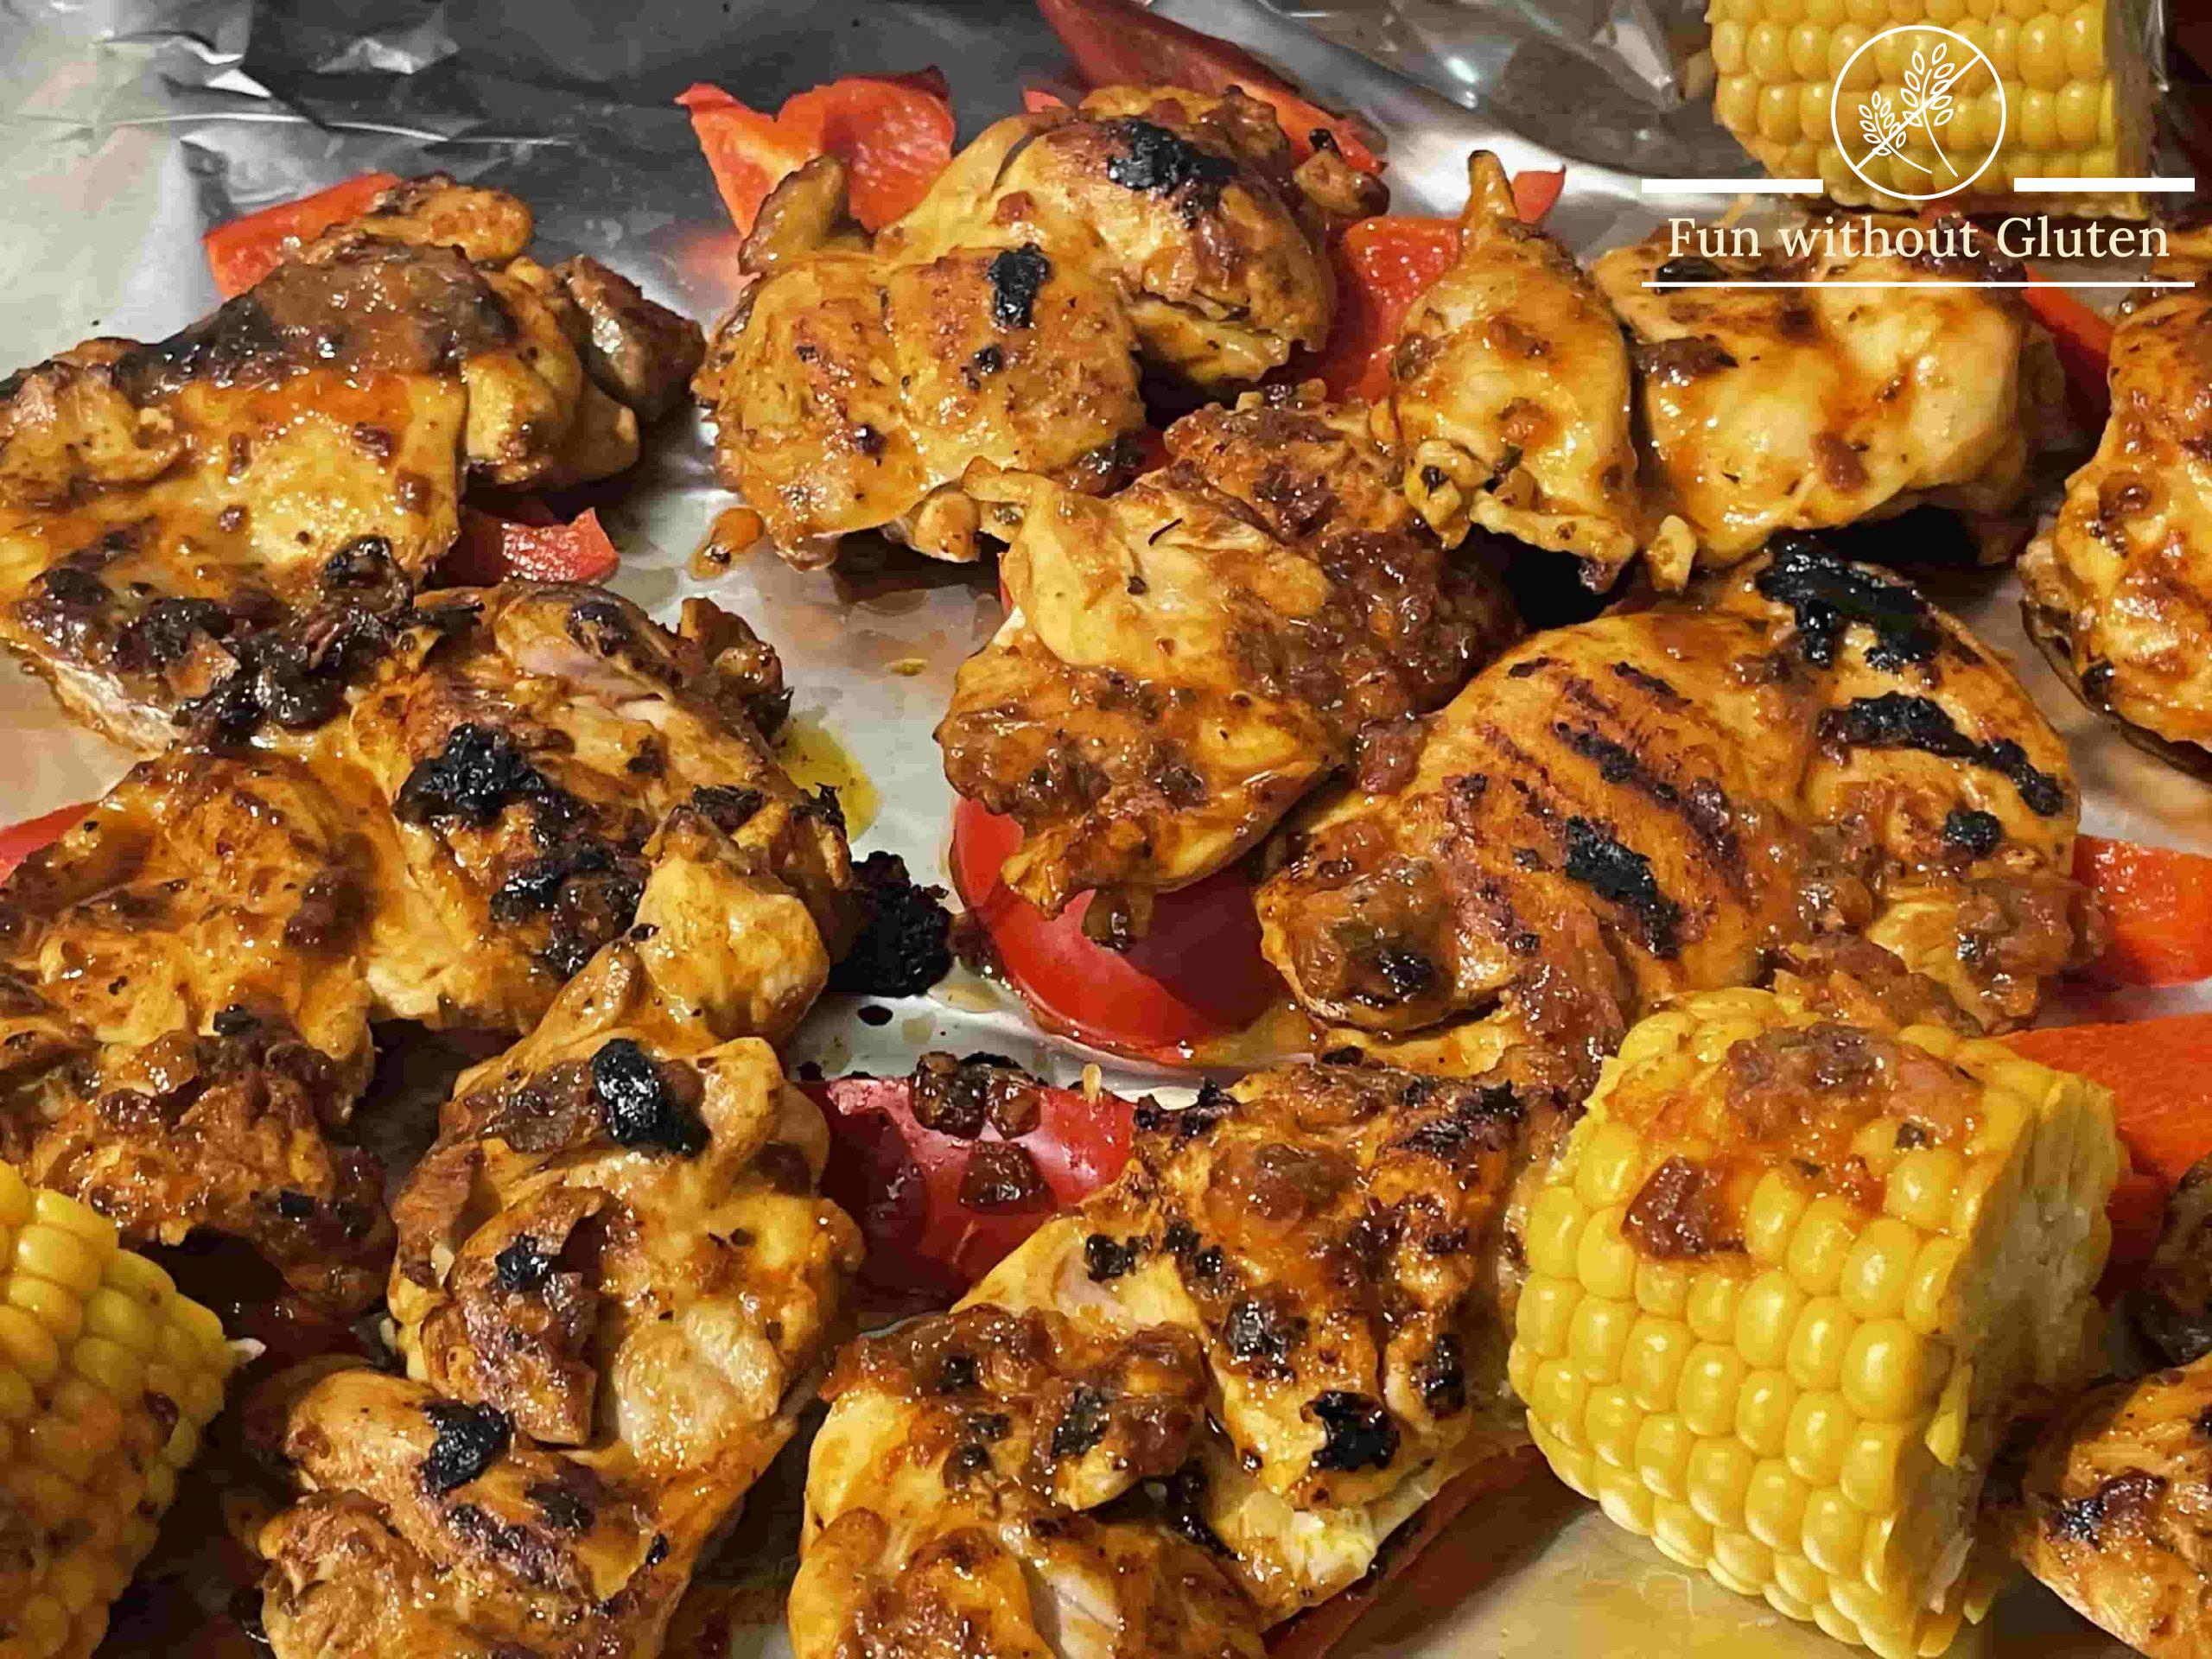 fun_without_gluten_sheet_pan_chicken